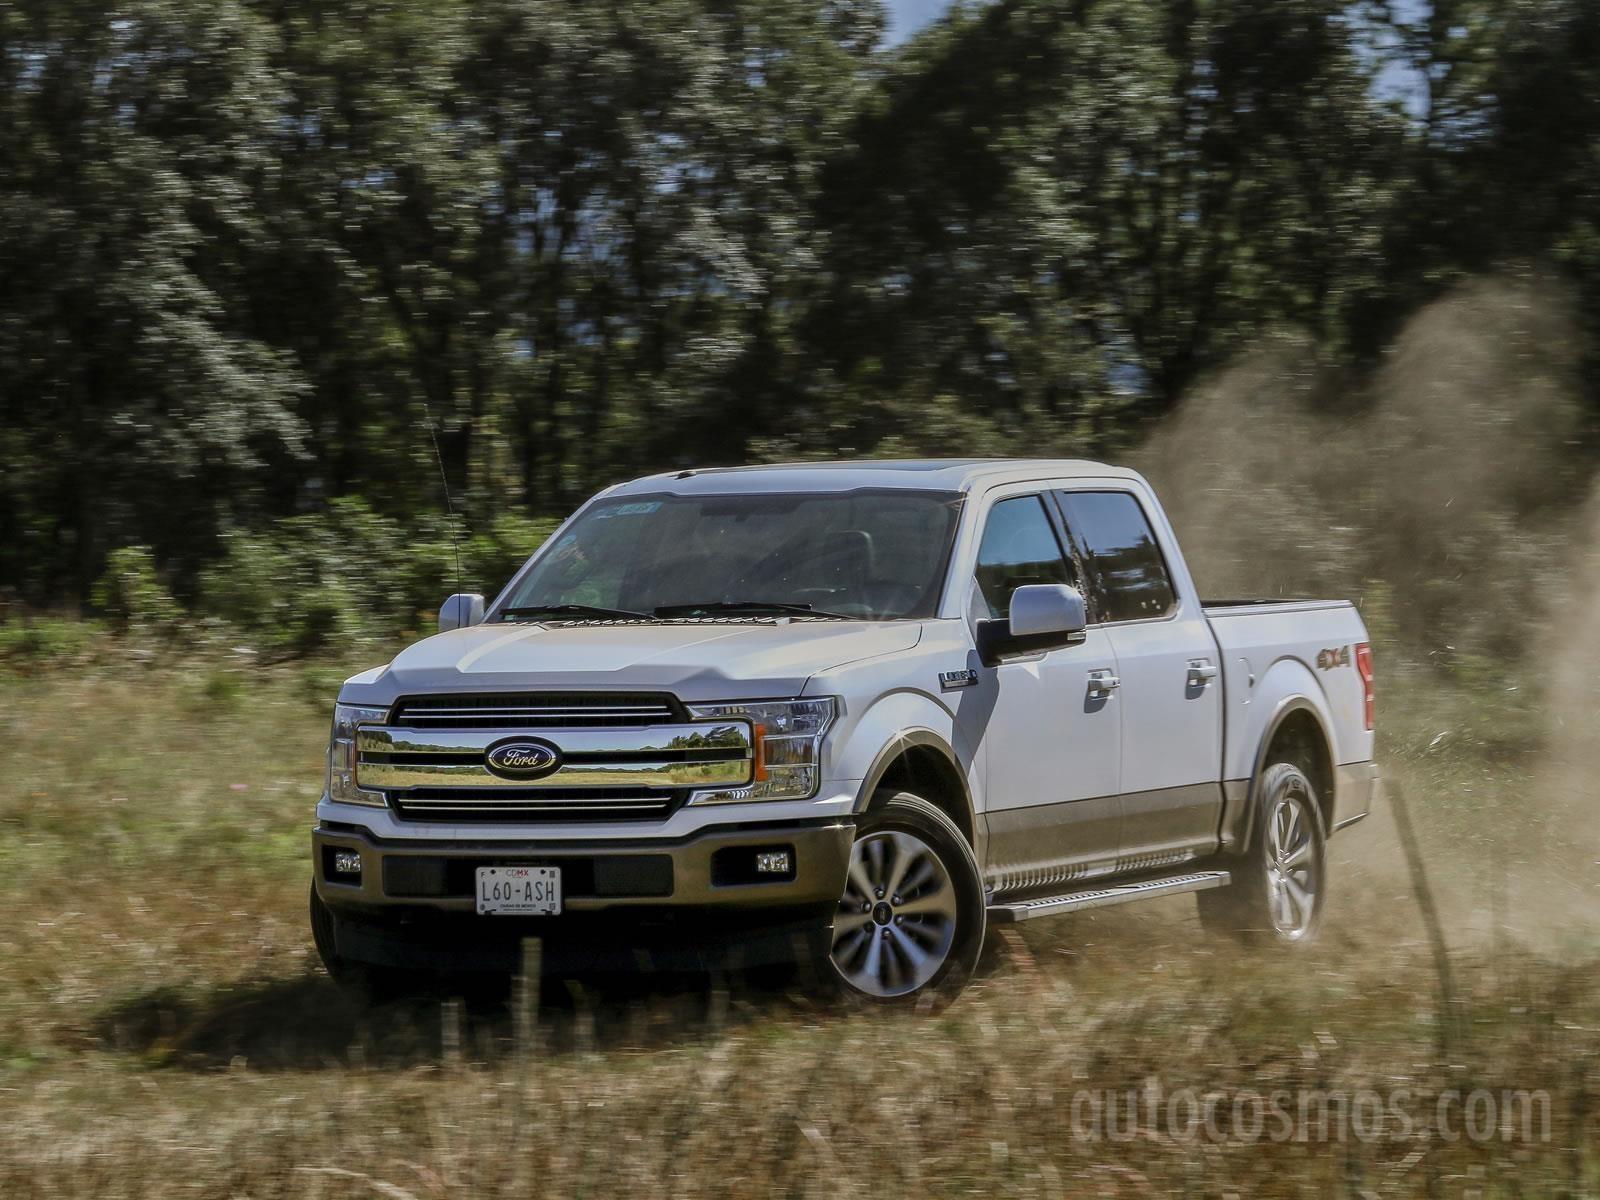 2019 Ford Lobo 2018 2019 2020 Ford Cars